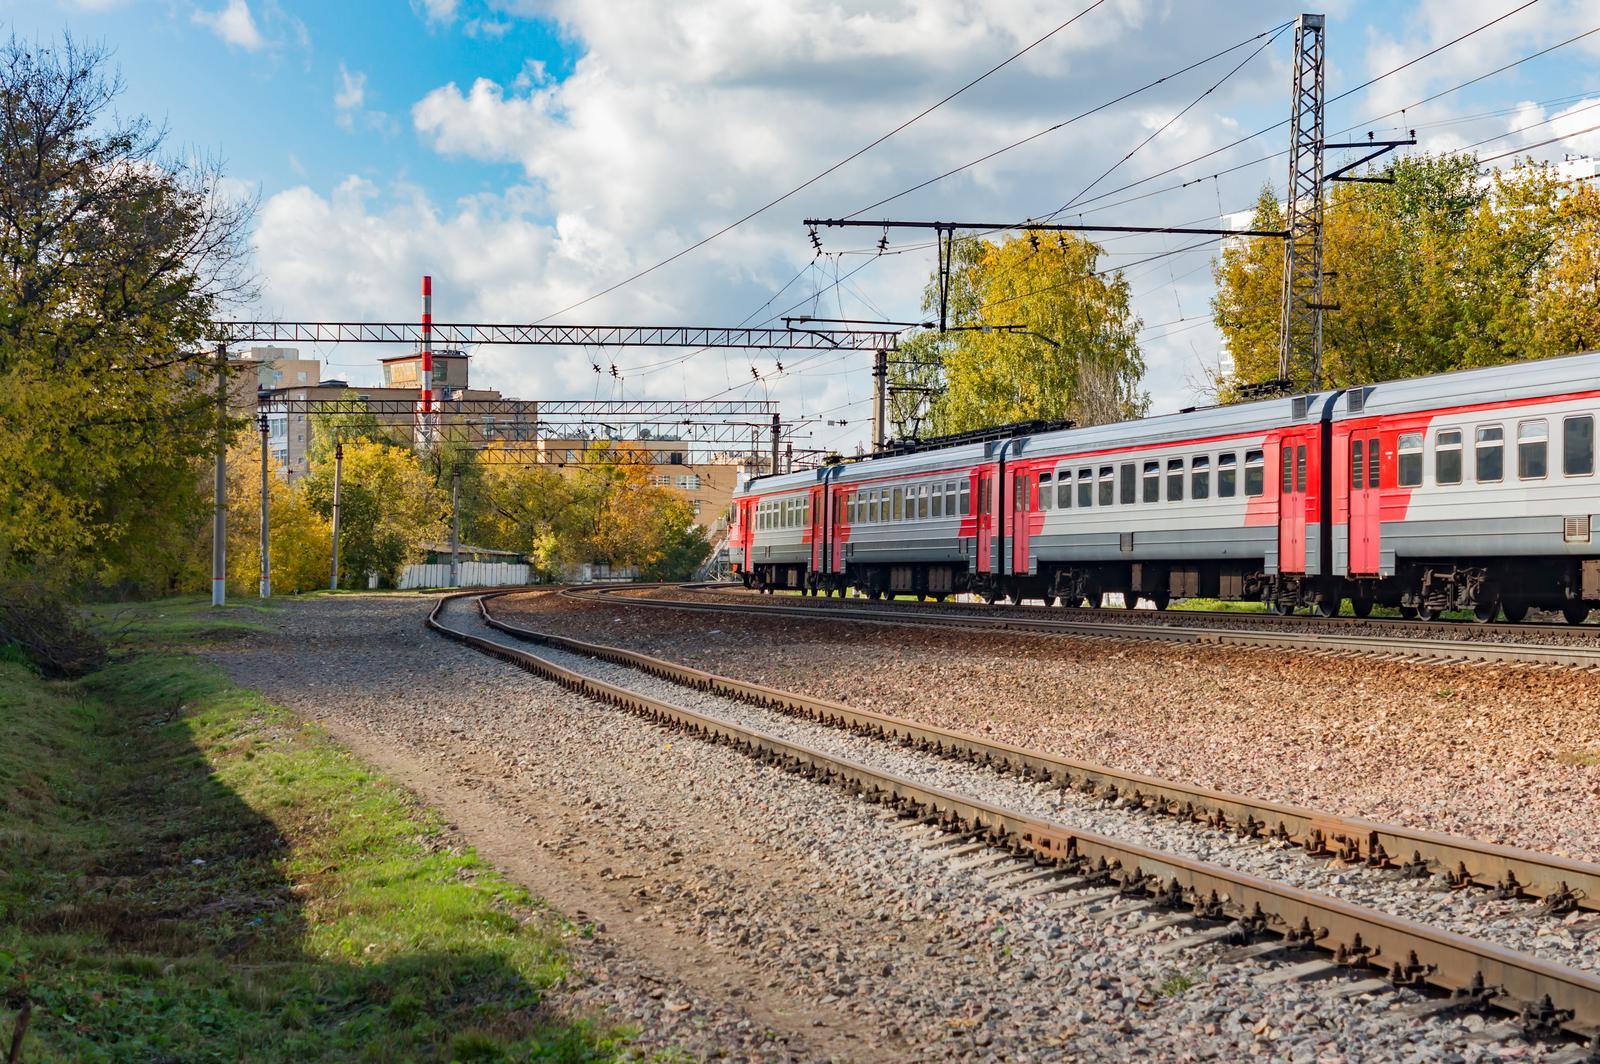 Other passenger land transport n.e.c. in Pärnu county